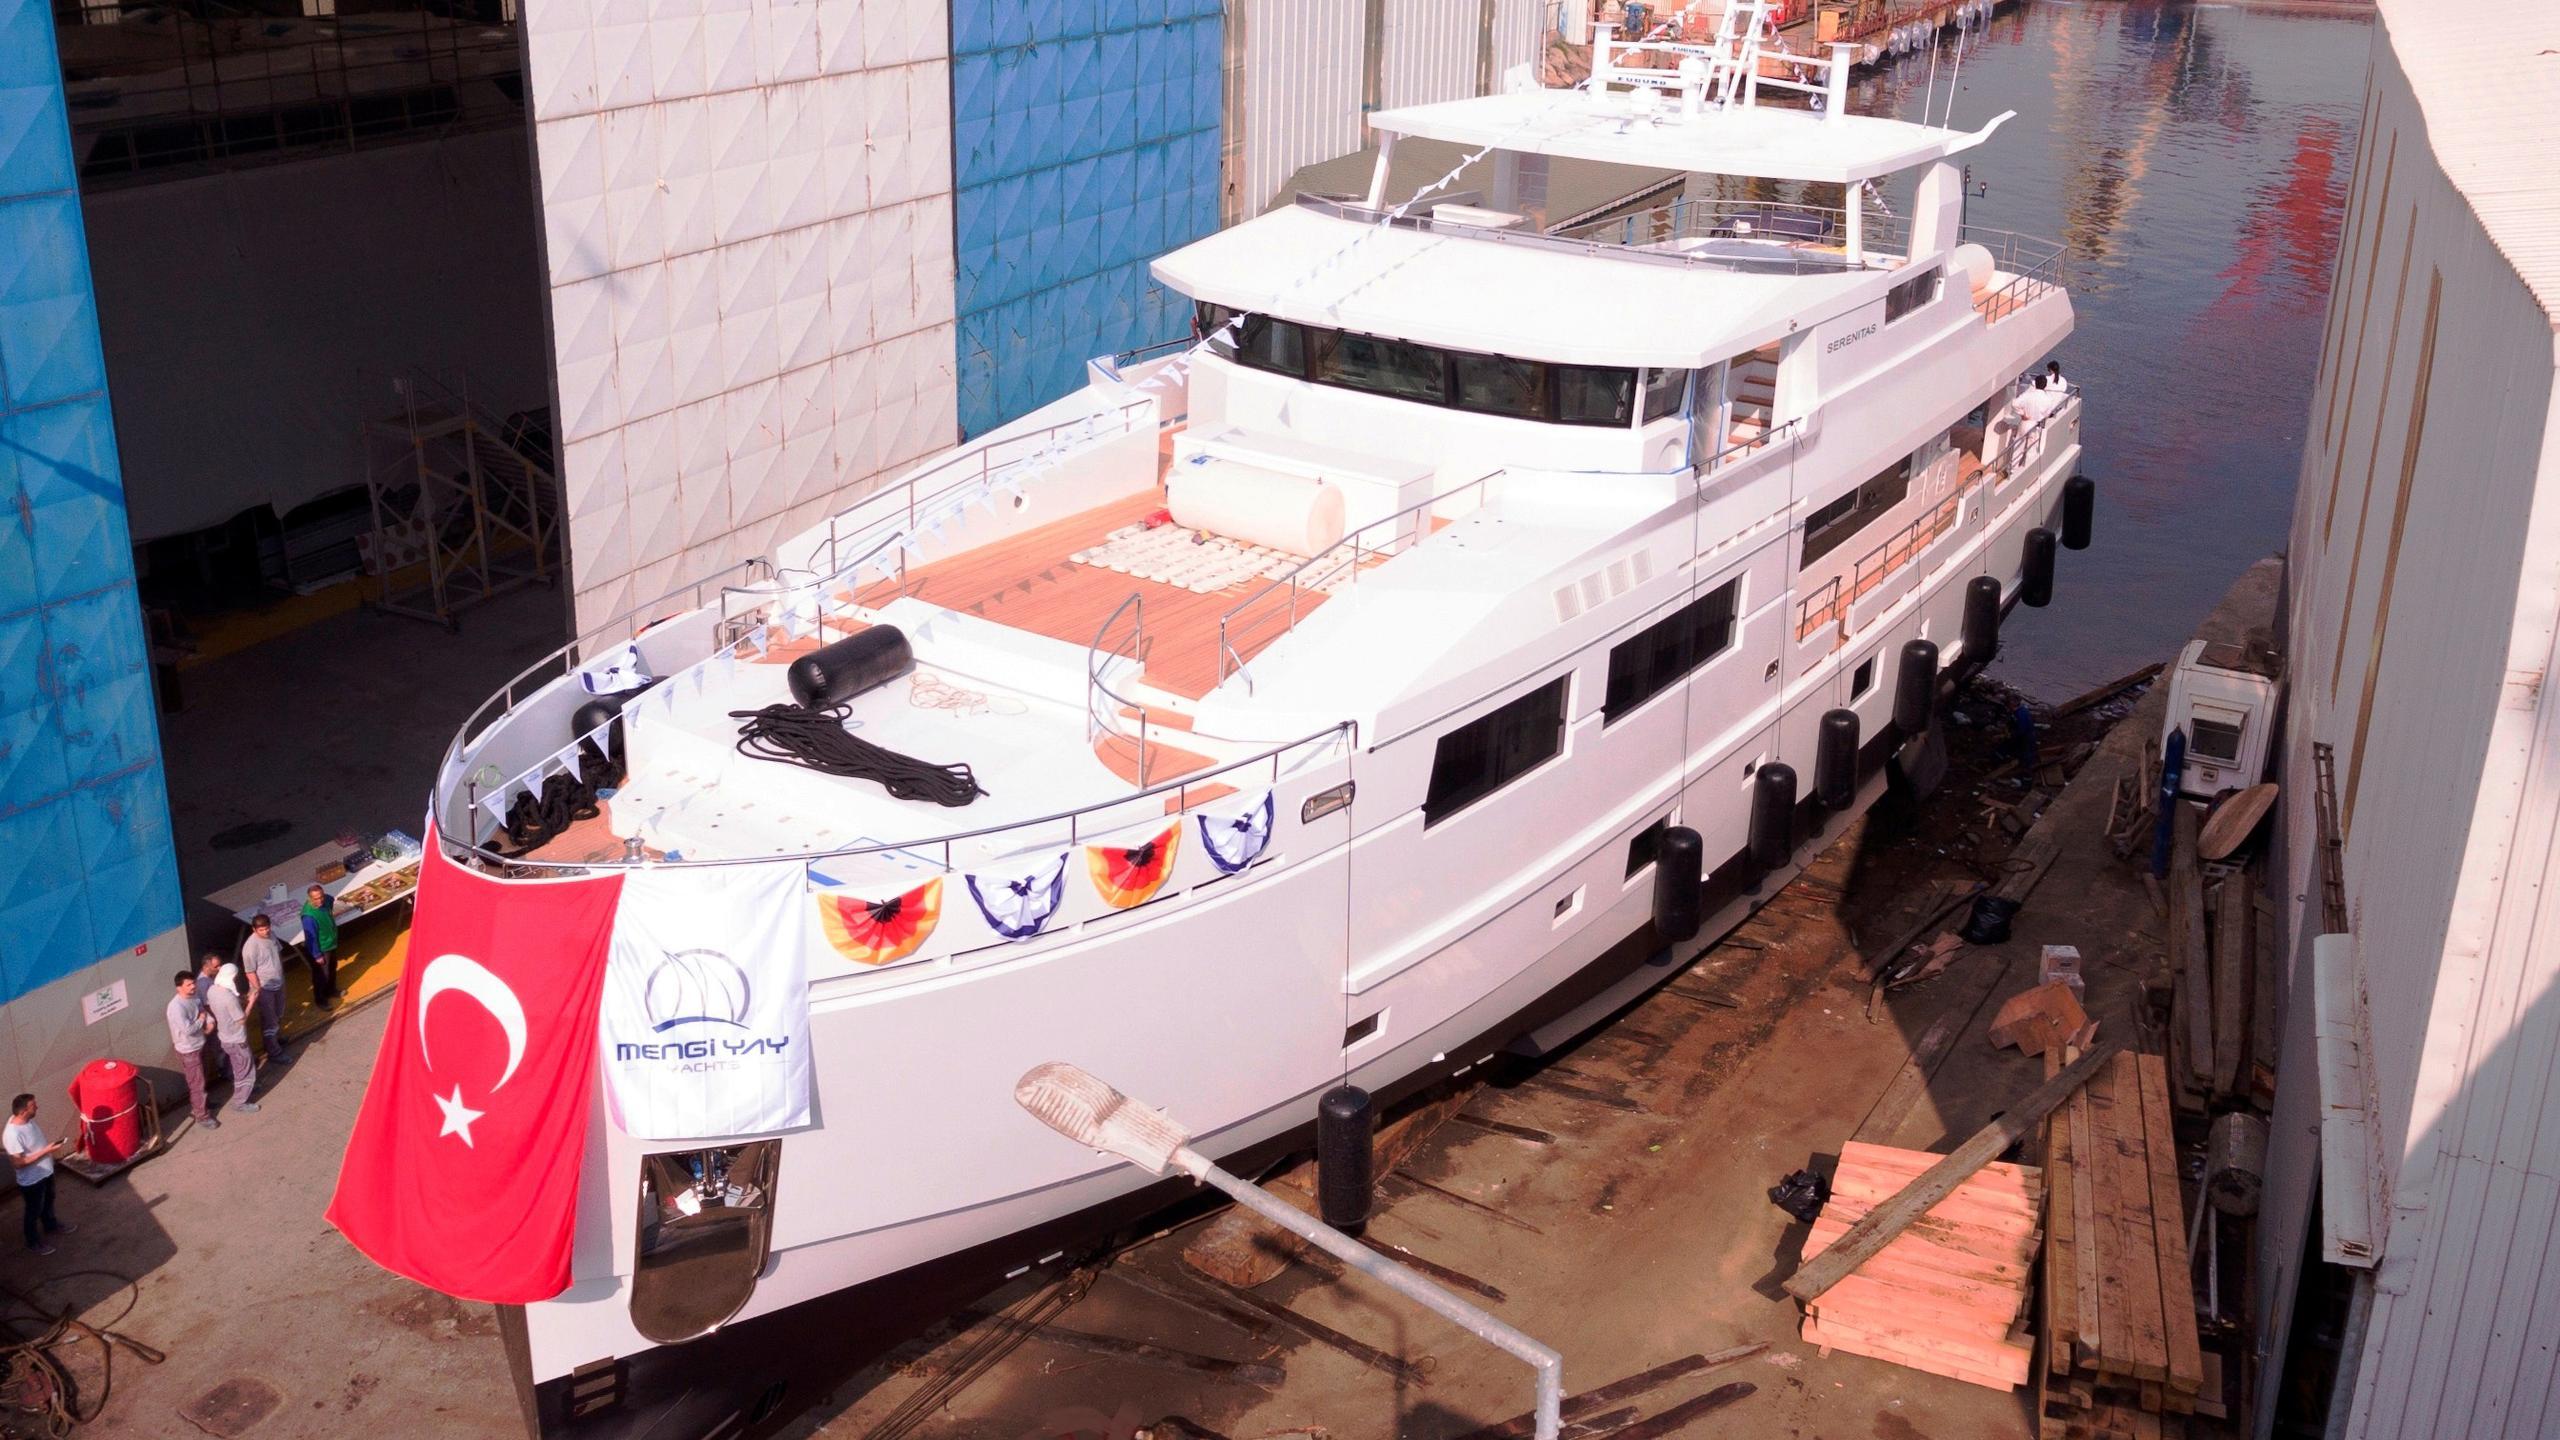 serenitas ii motoryacht mengi yay 32m 2017 launch half profile